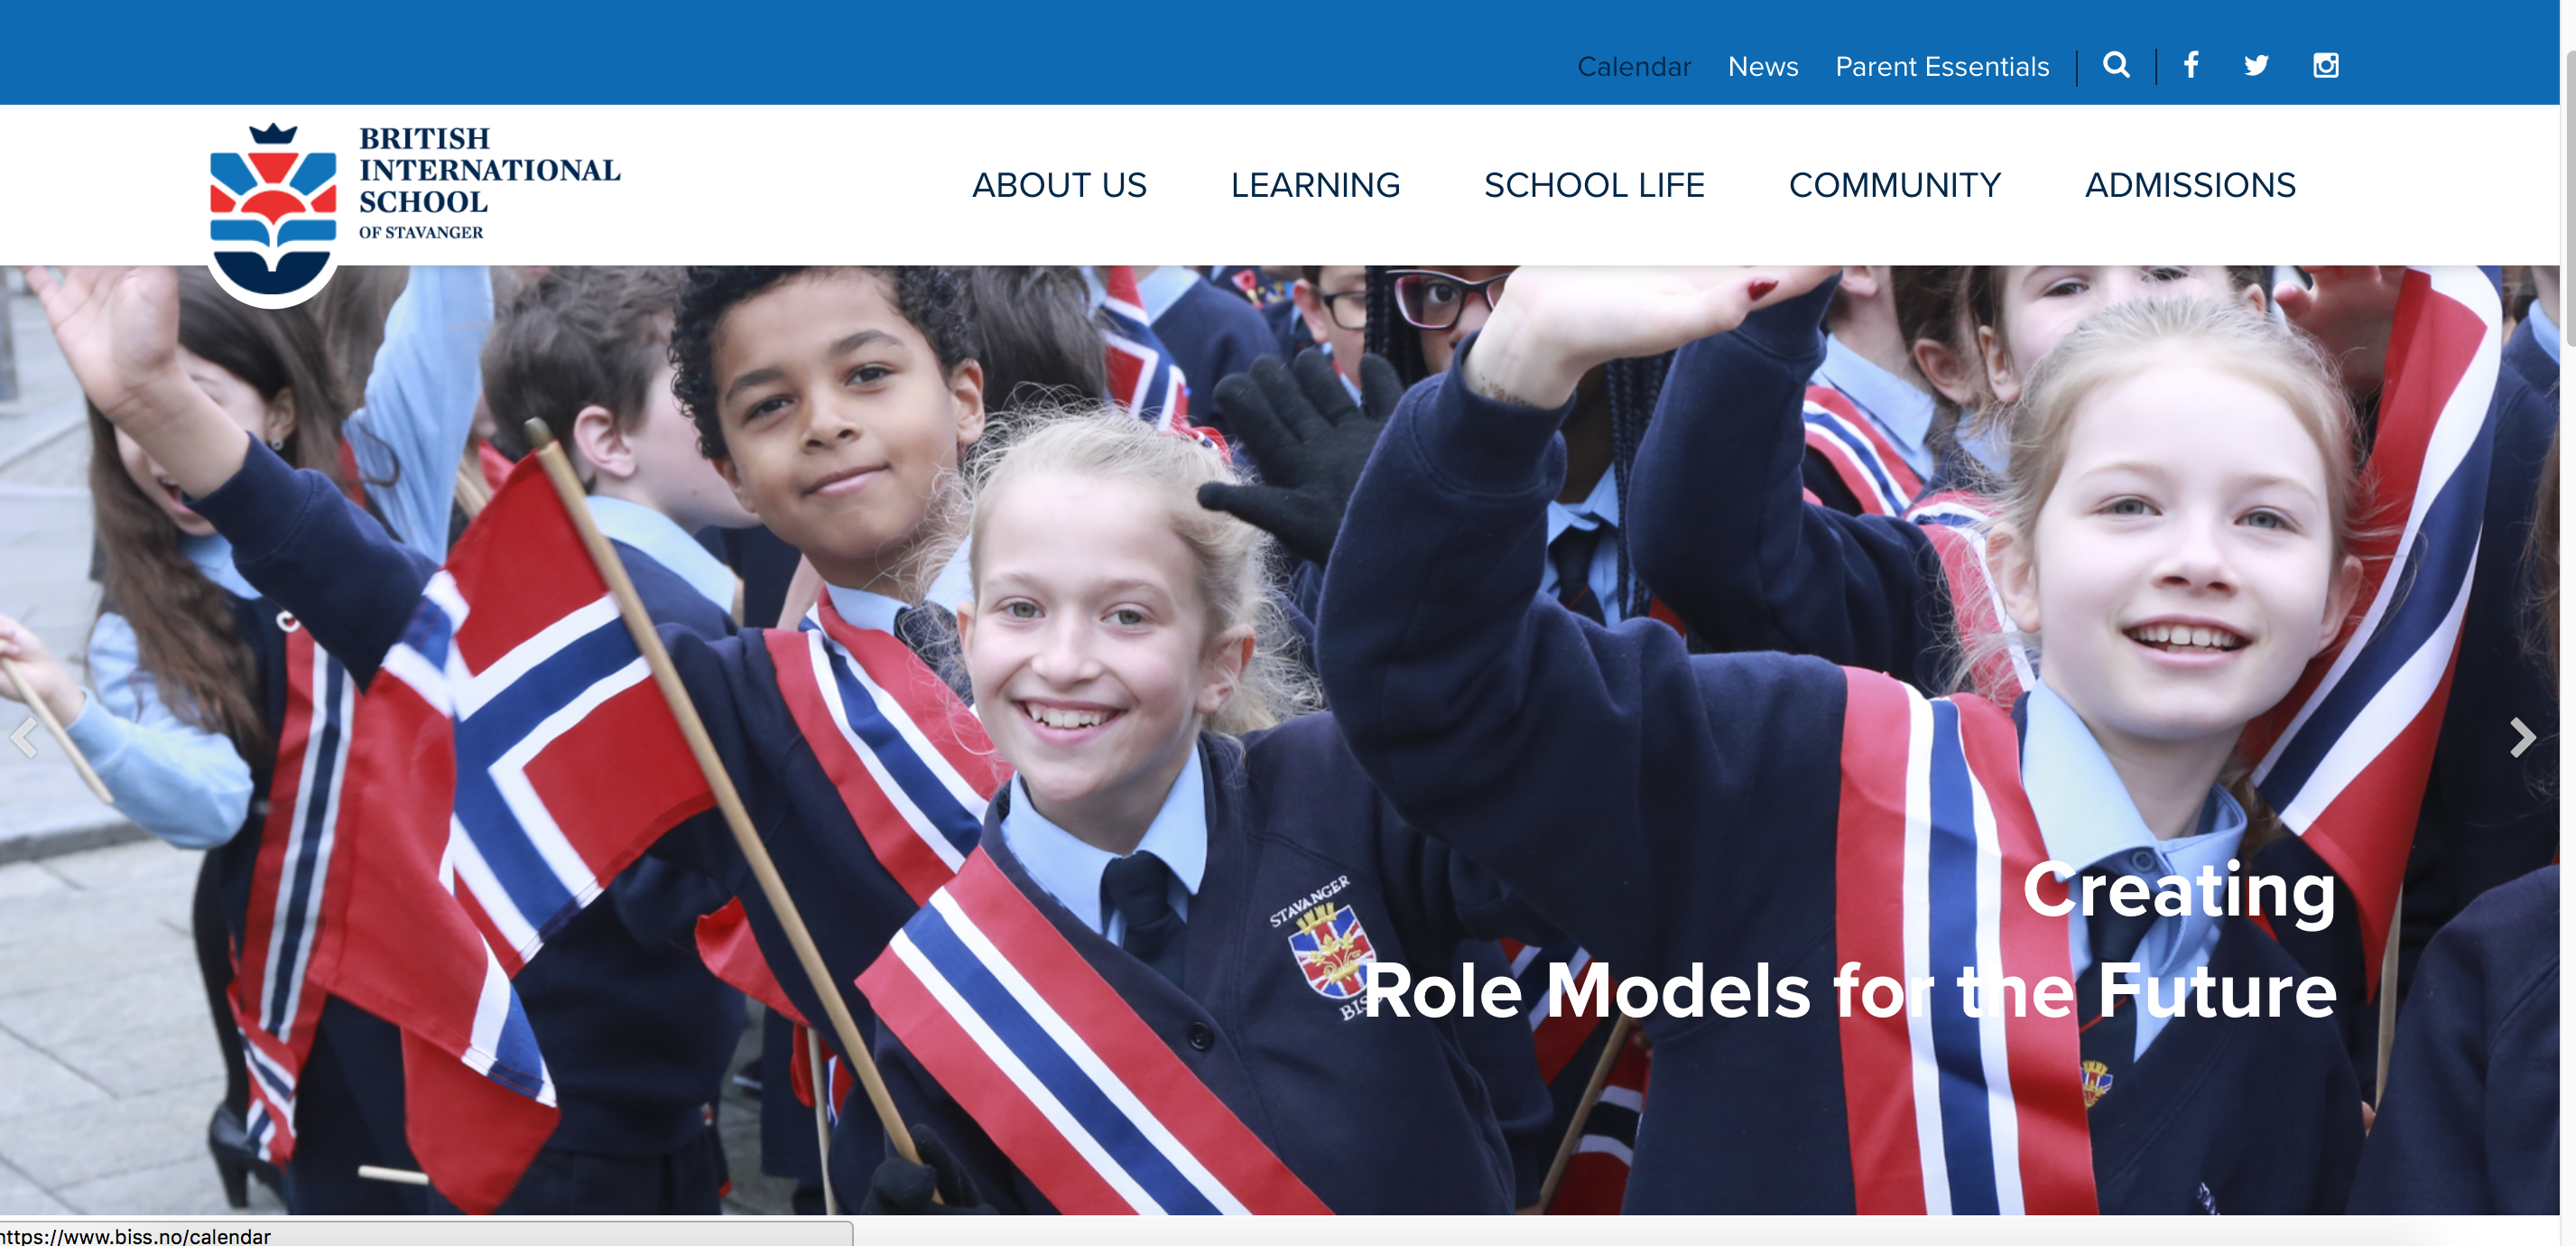 BISS Homepage